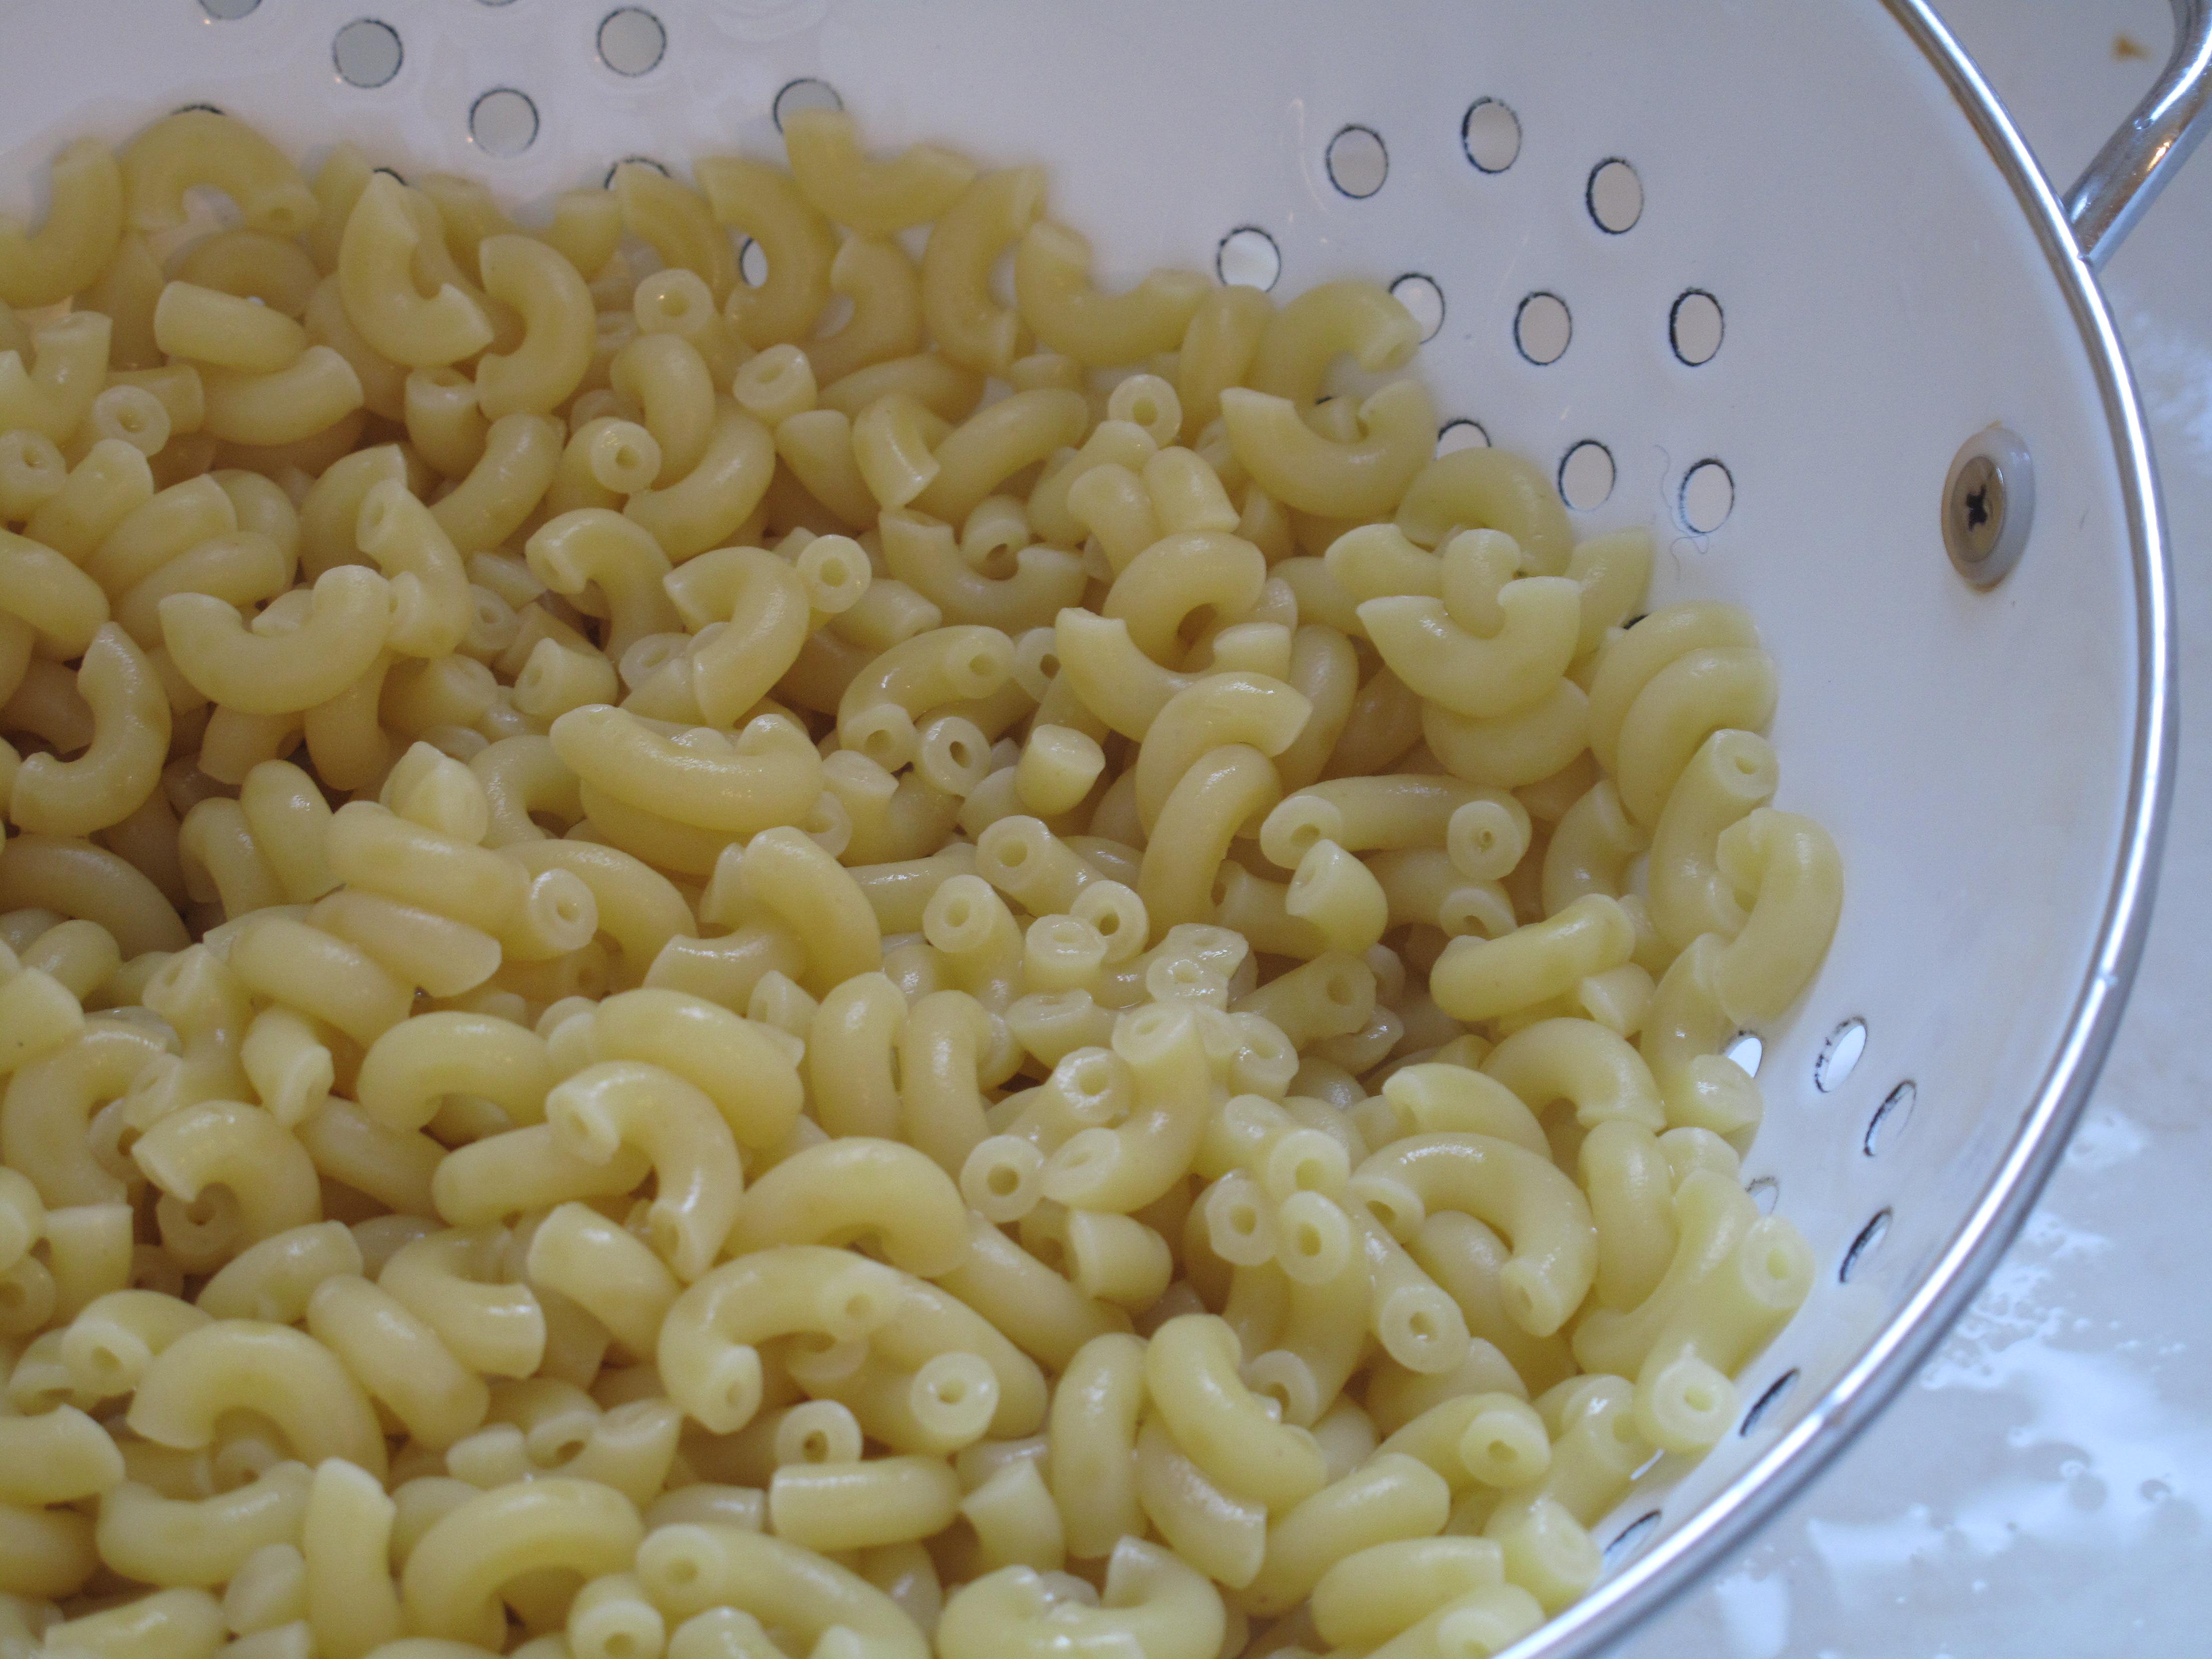 Mac Attack! Tex-Mex Macaroni and Cheese | POPSUGAR Food